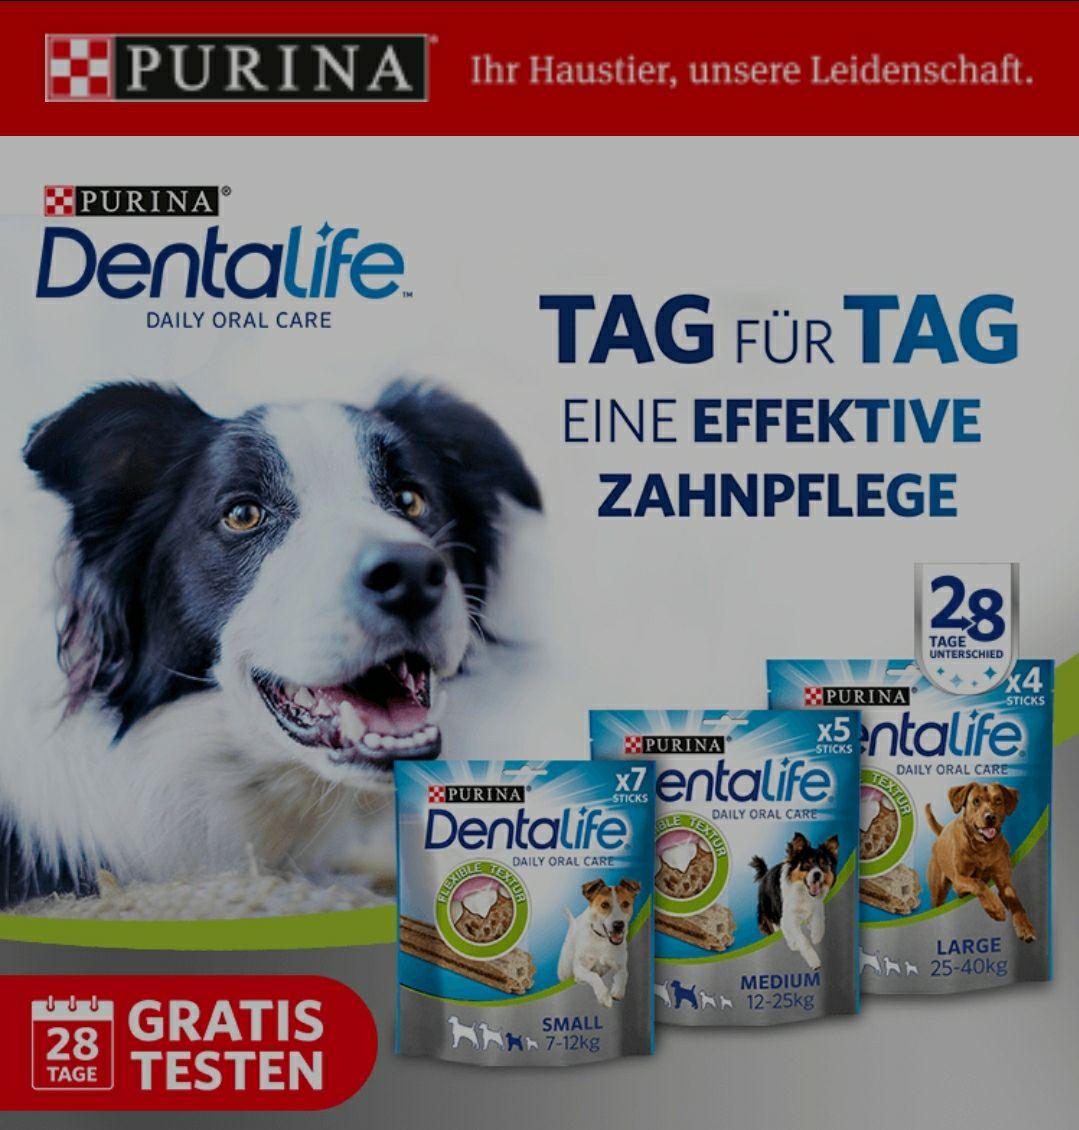 [GzG] Purina Dentalife Gratis Testen